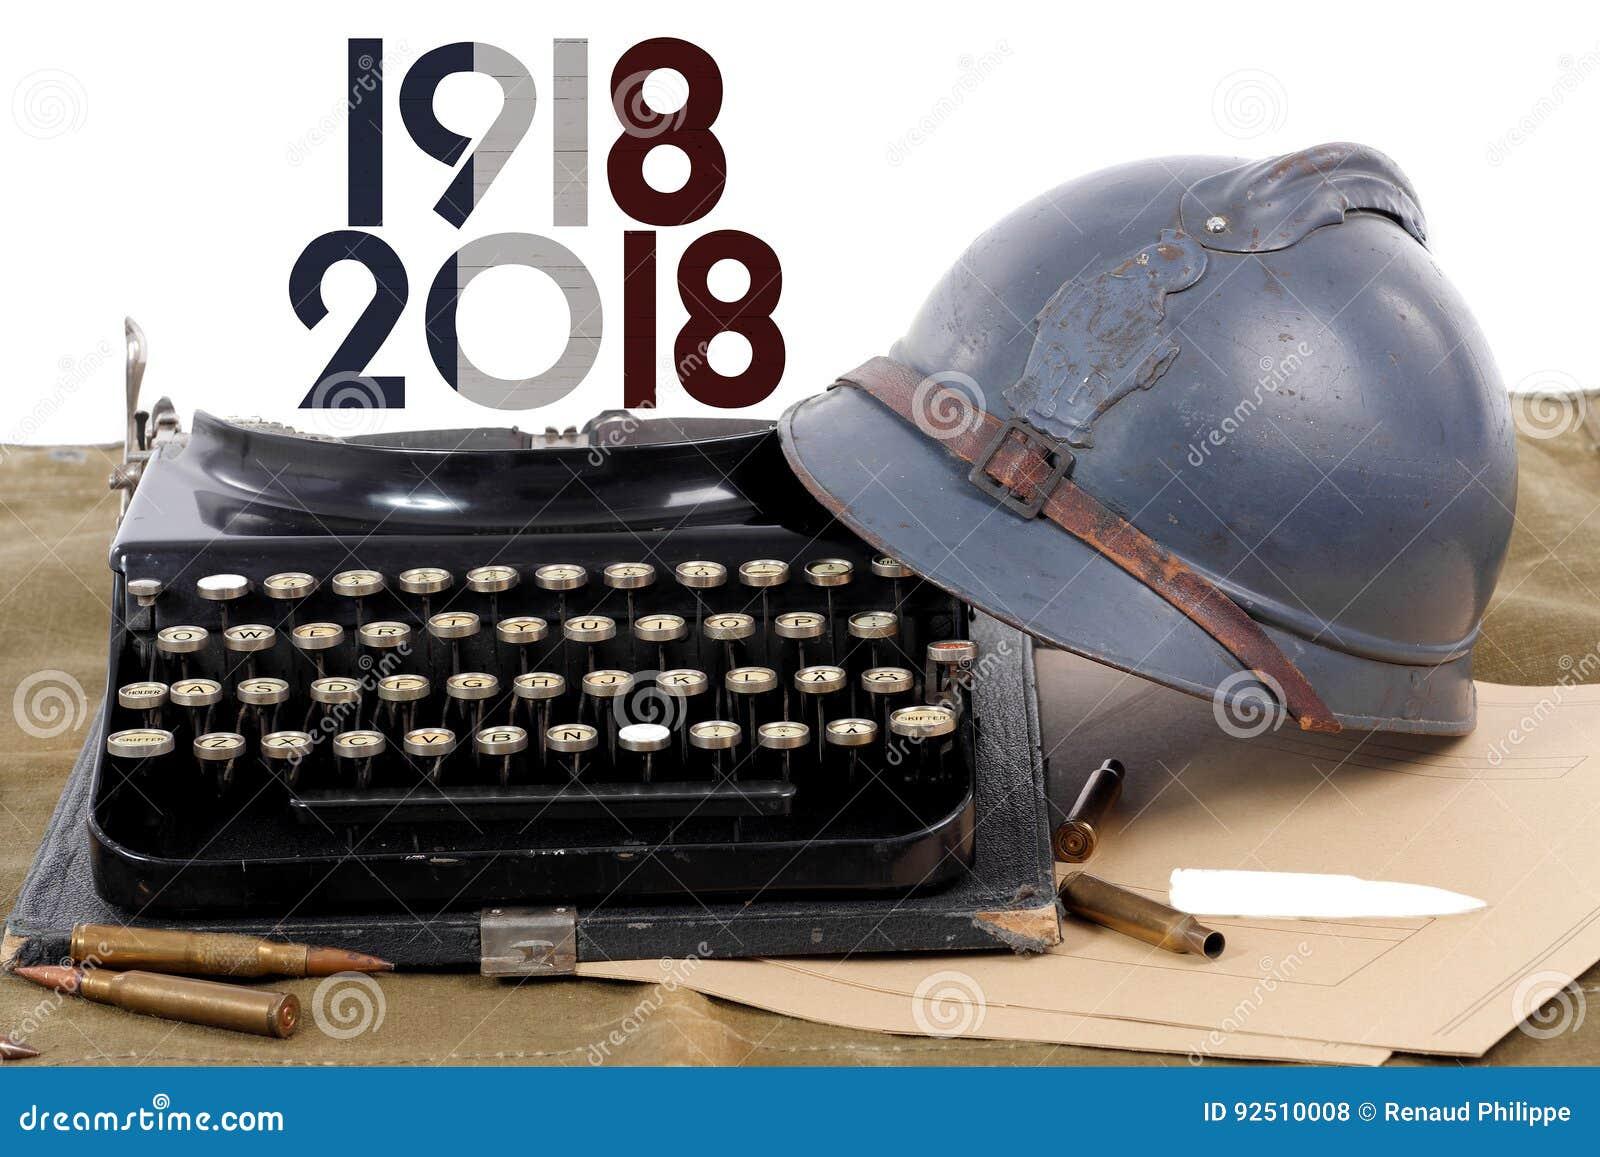 El casco militar francés de la primera guerra mundial con viejo escribe a máquina